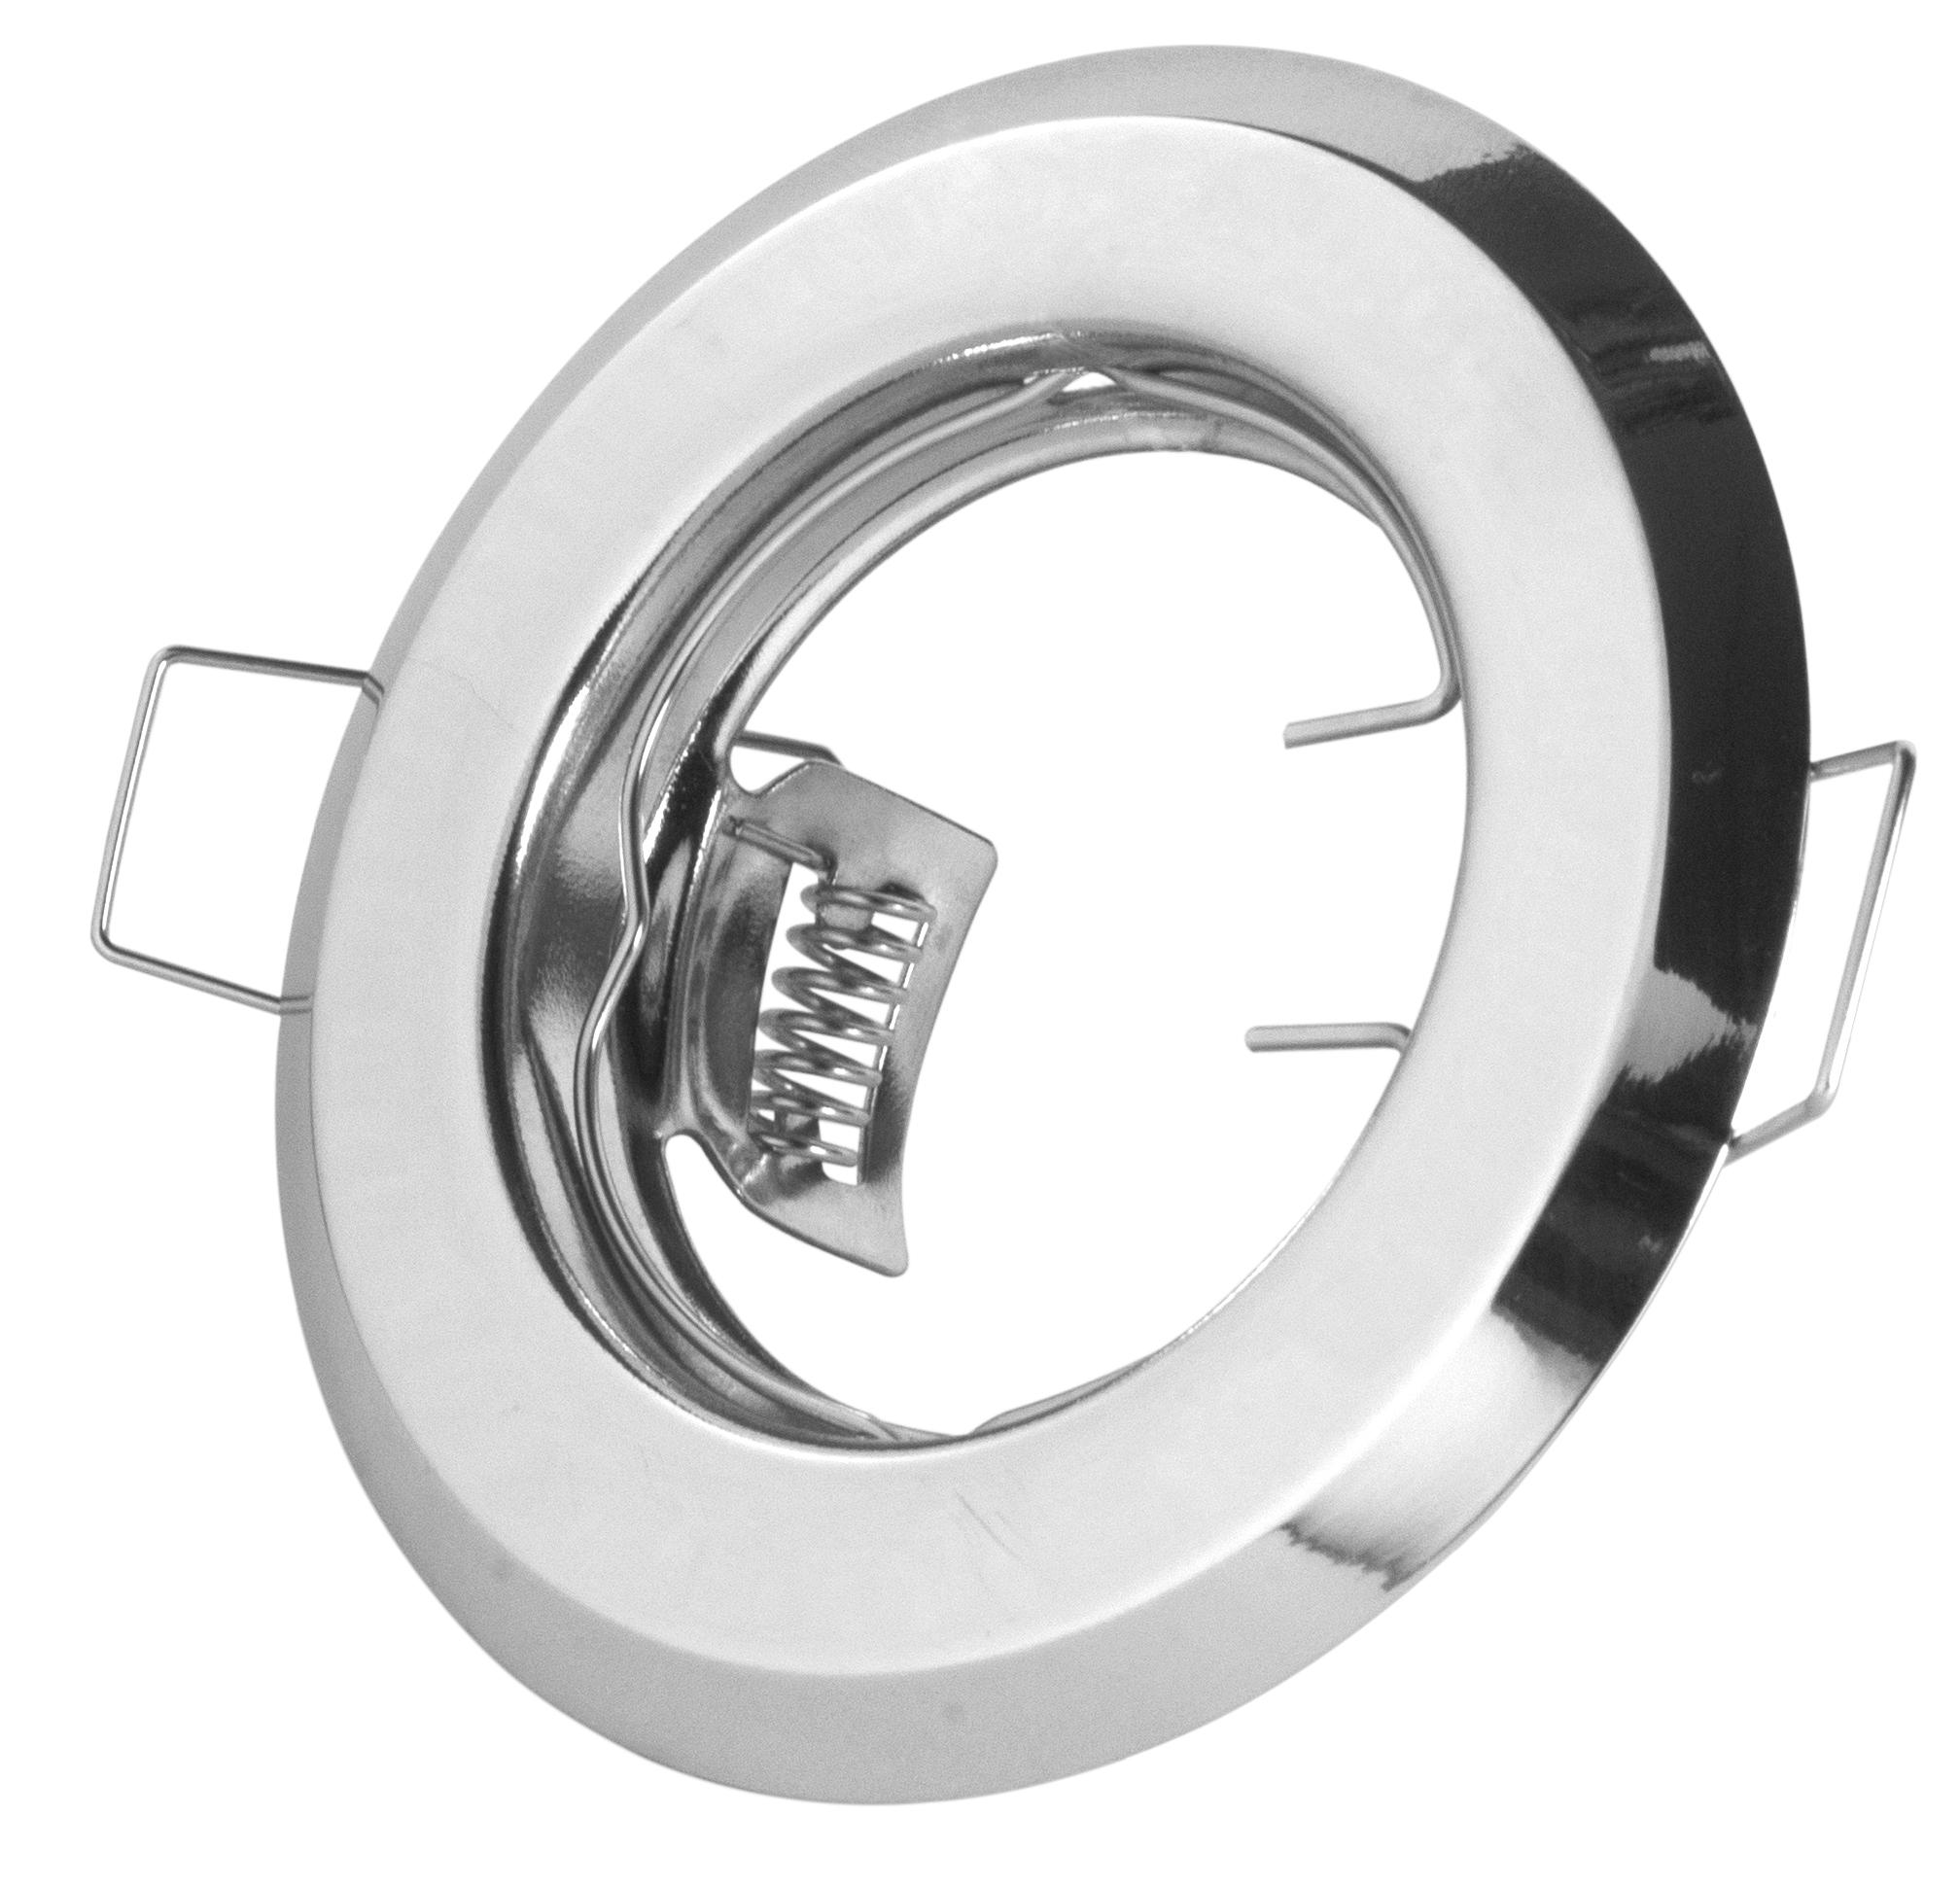 restposten einbaustrahler david f r 50mm leuchtmittel stahl chrom einbaustrahler. Black Bedroom Furniture Sets. Home Design Ideas